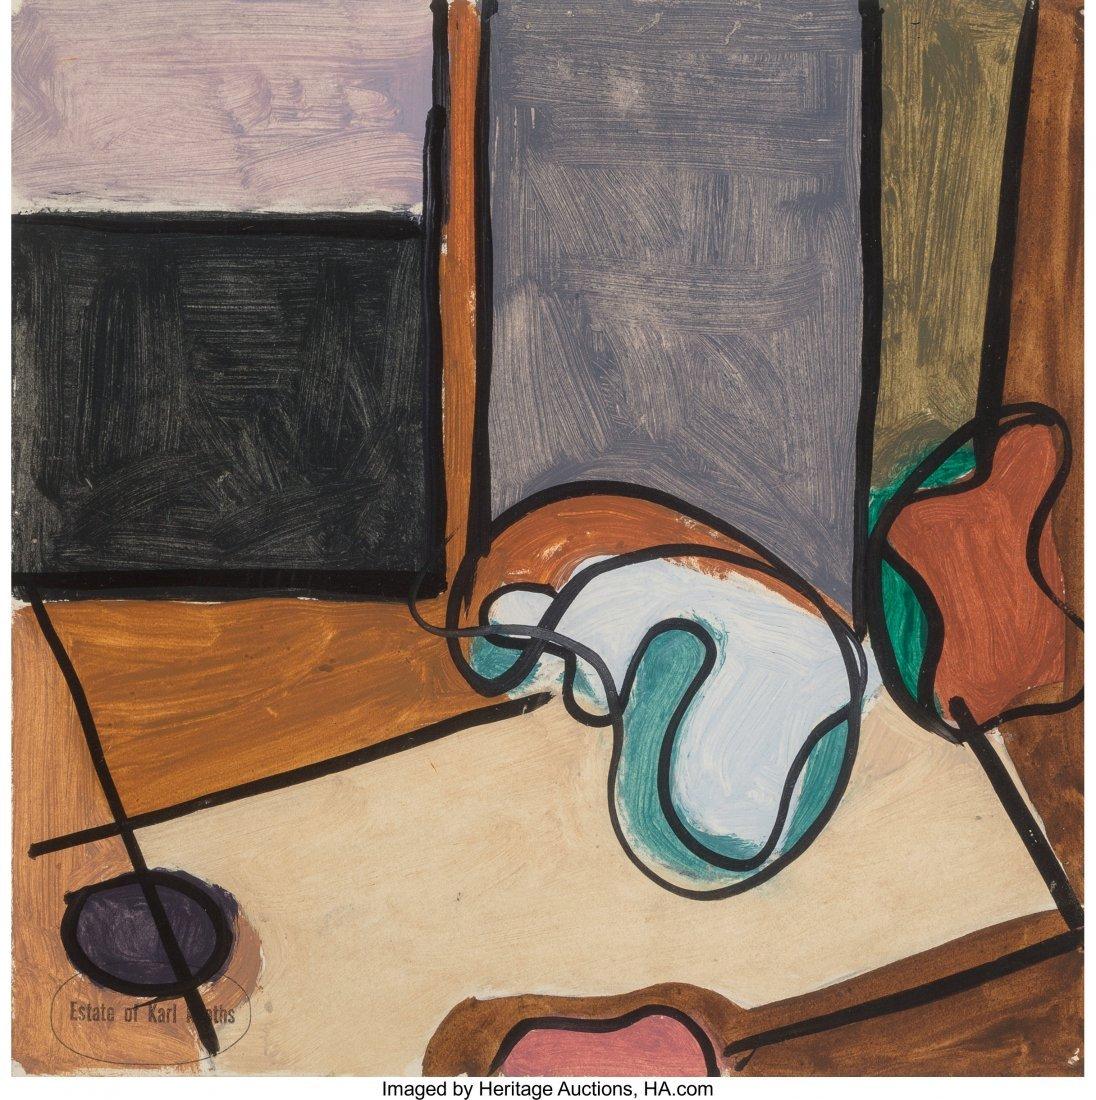 63772: Karl Knaths (American, 1891-1971) Abstract Study